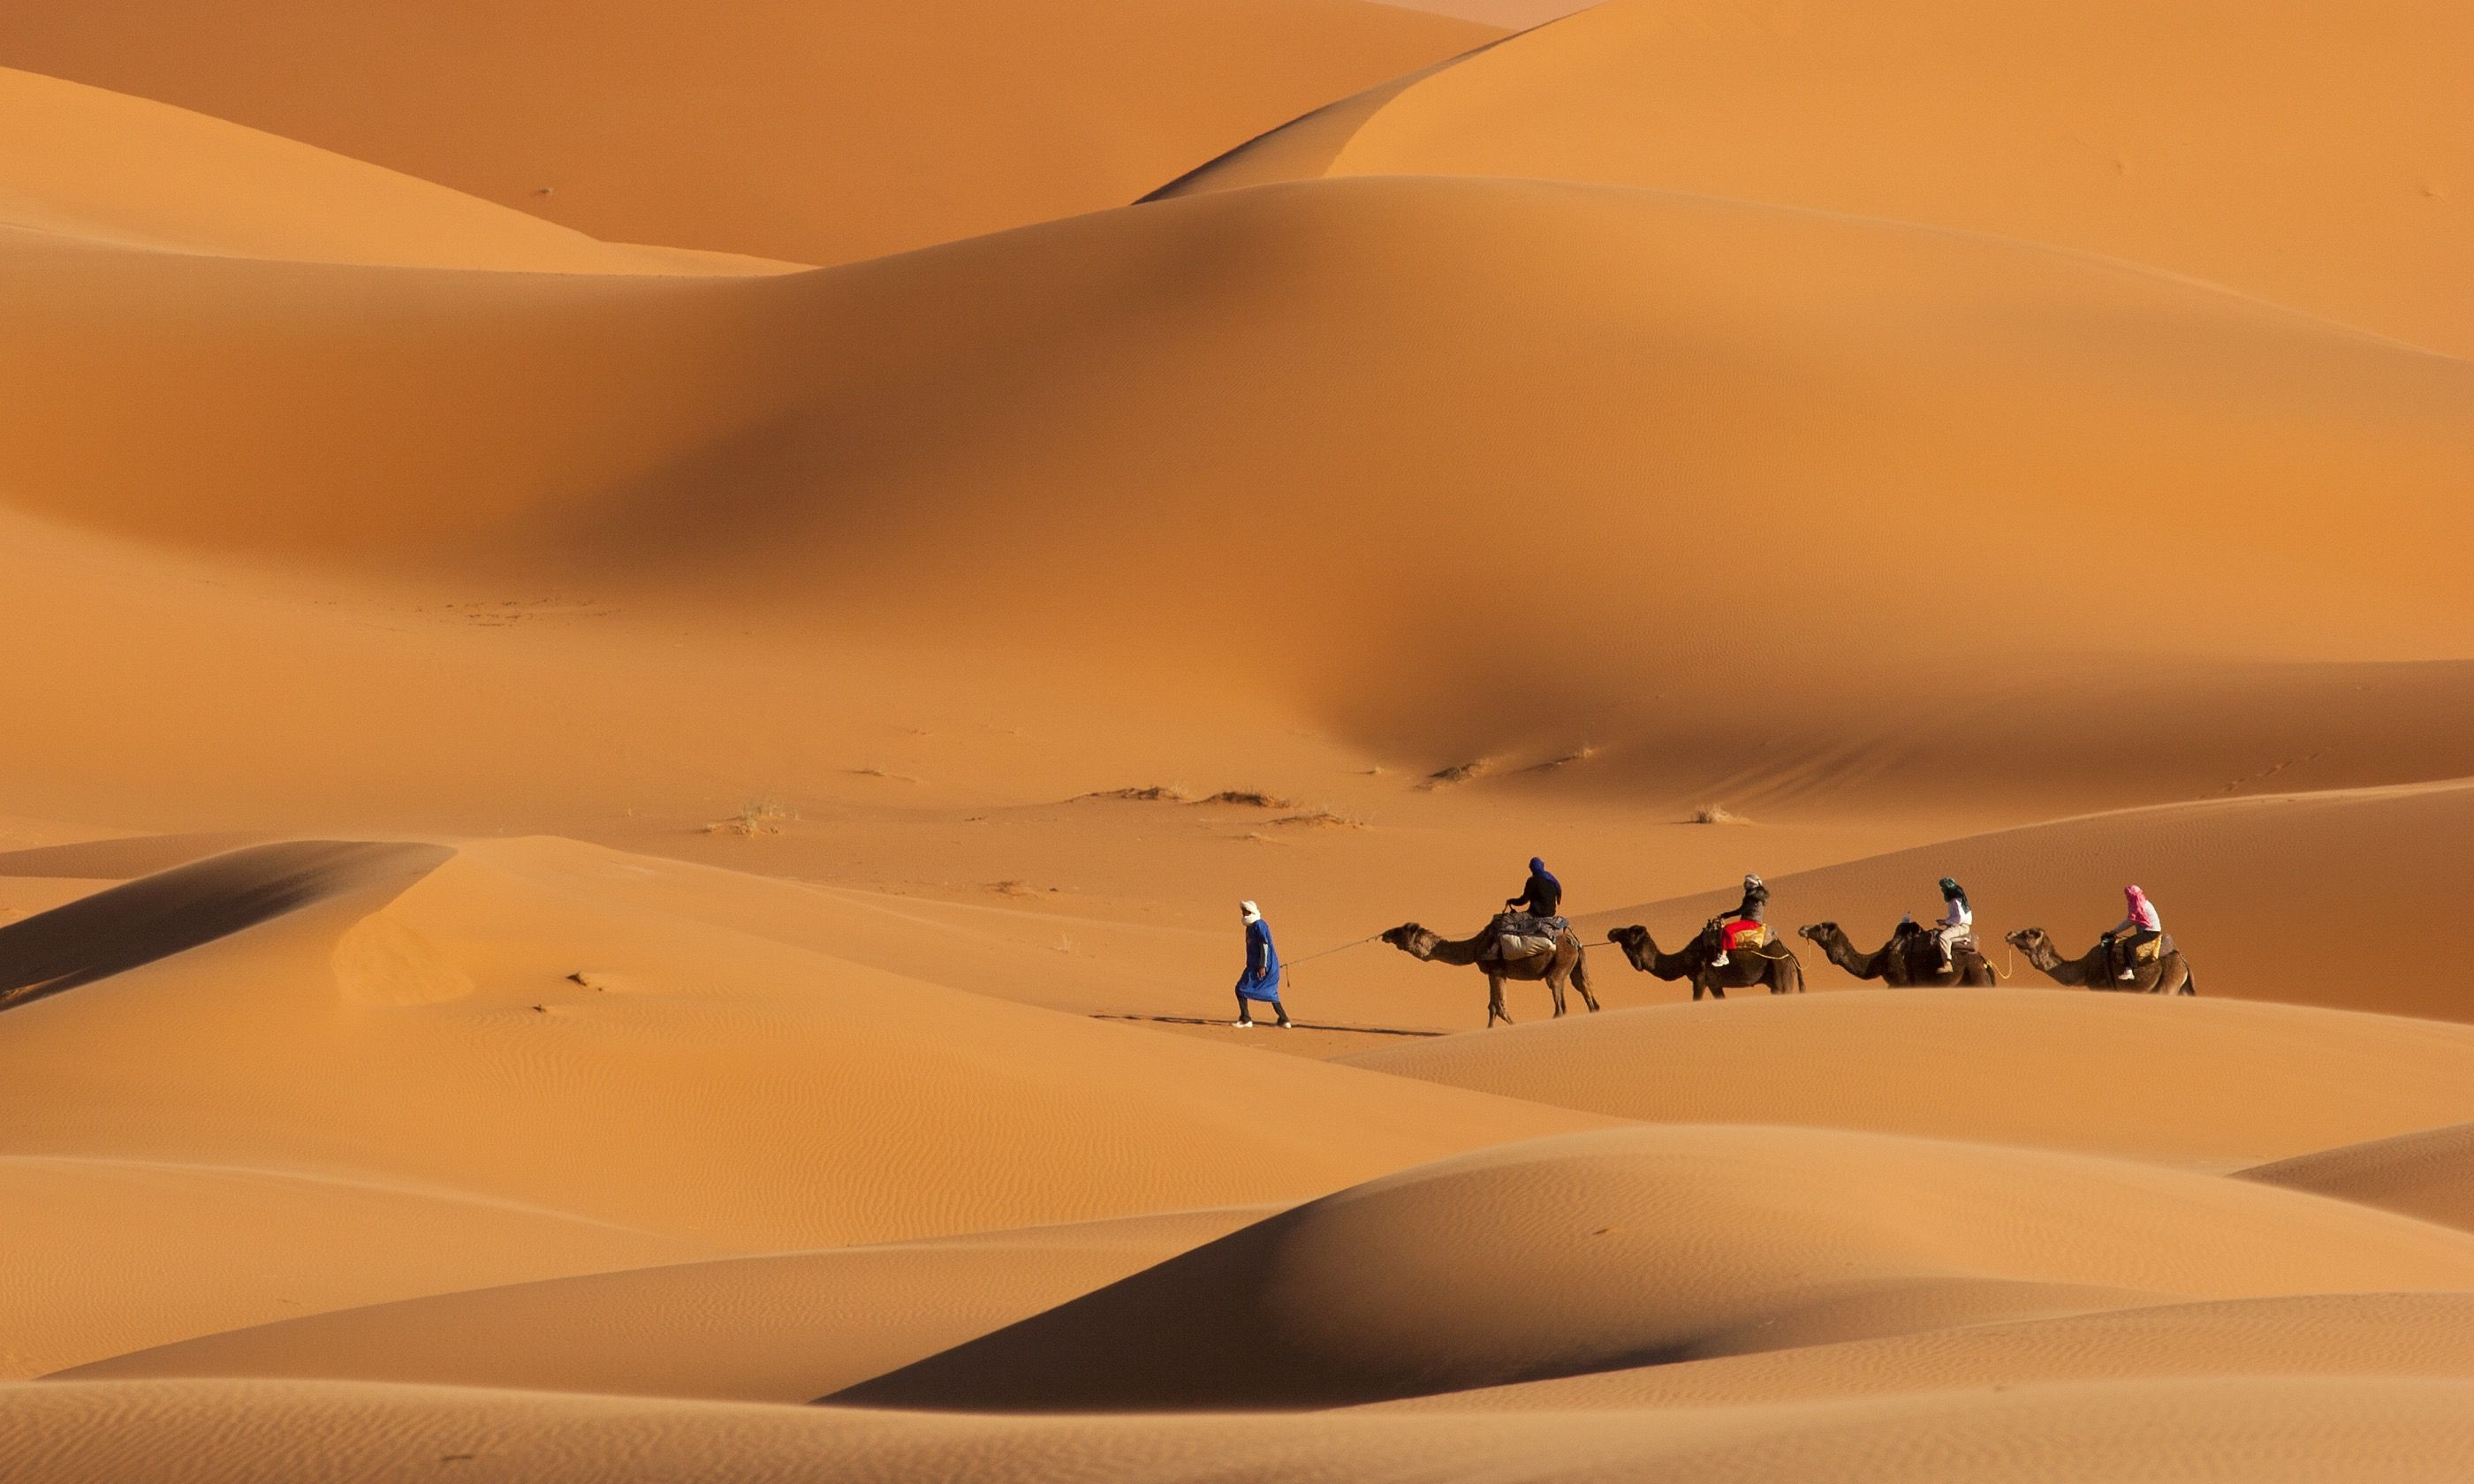 Camel trekking, Morocco (Shutterstock.com)